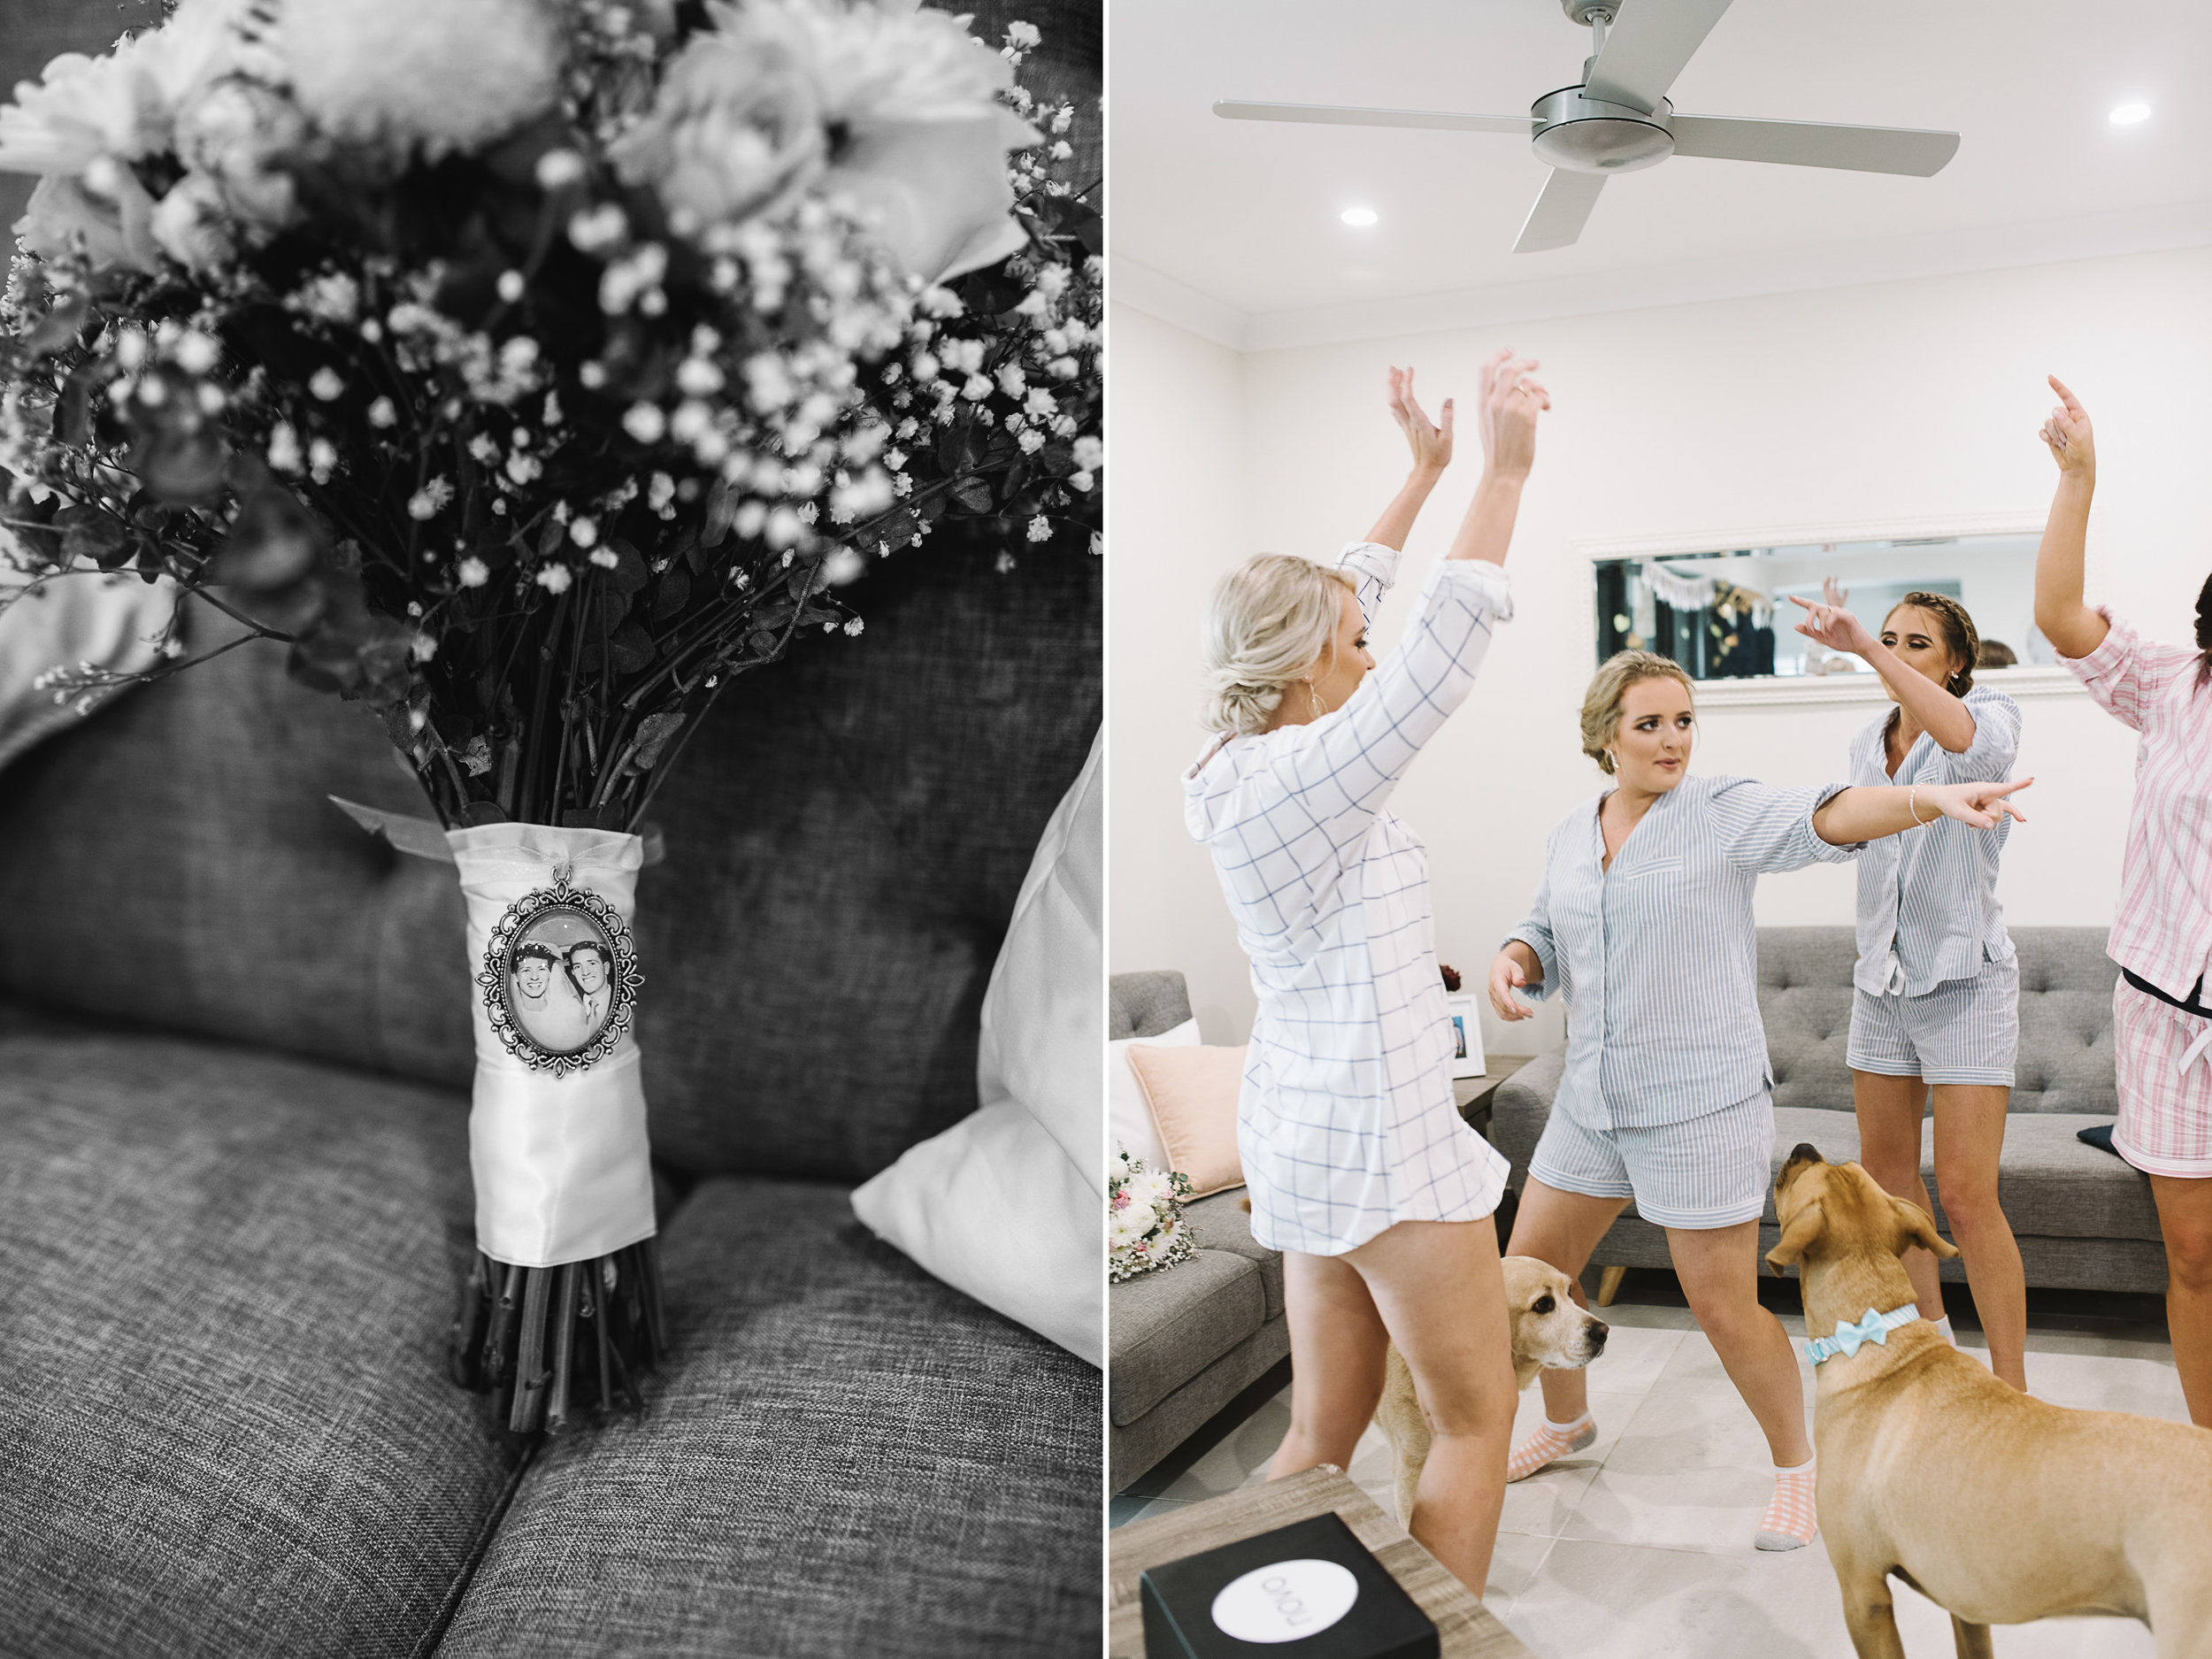 Brisbane-wedding-photography-11.jpg